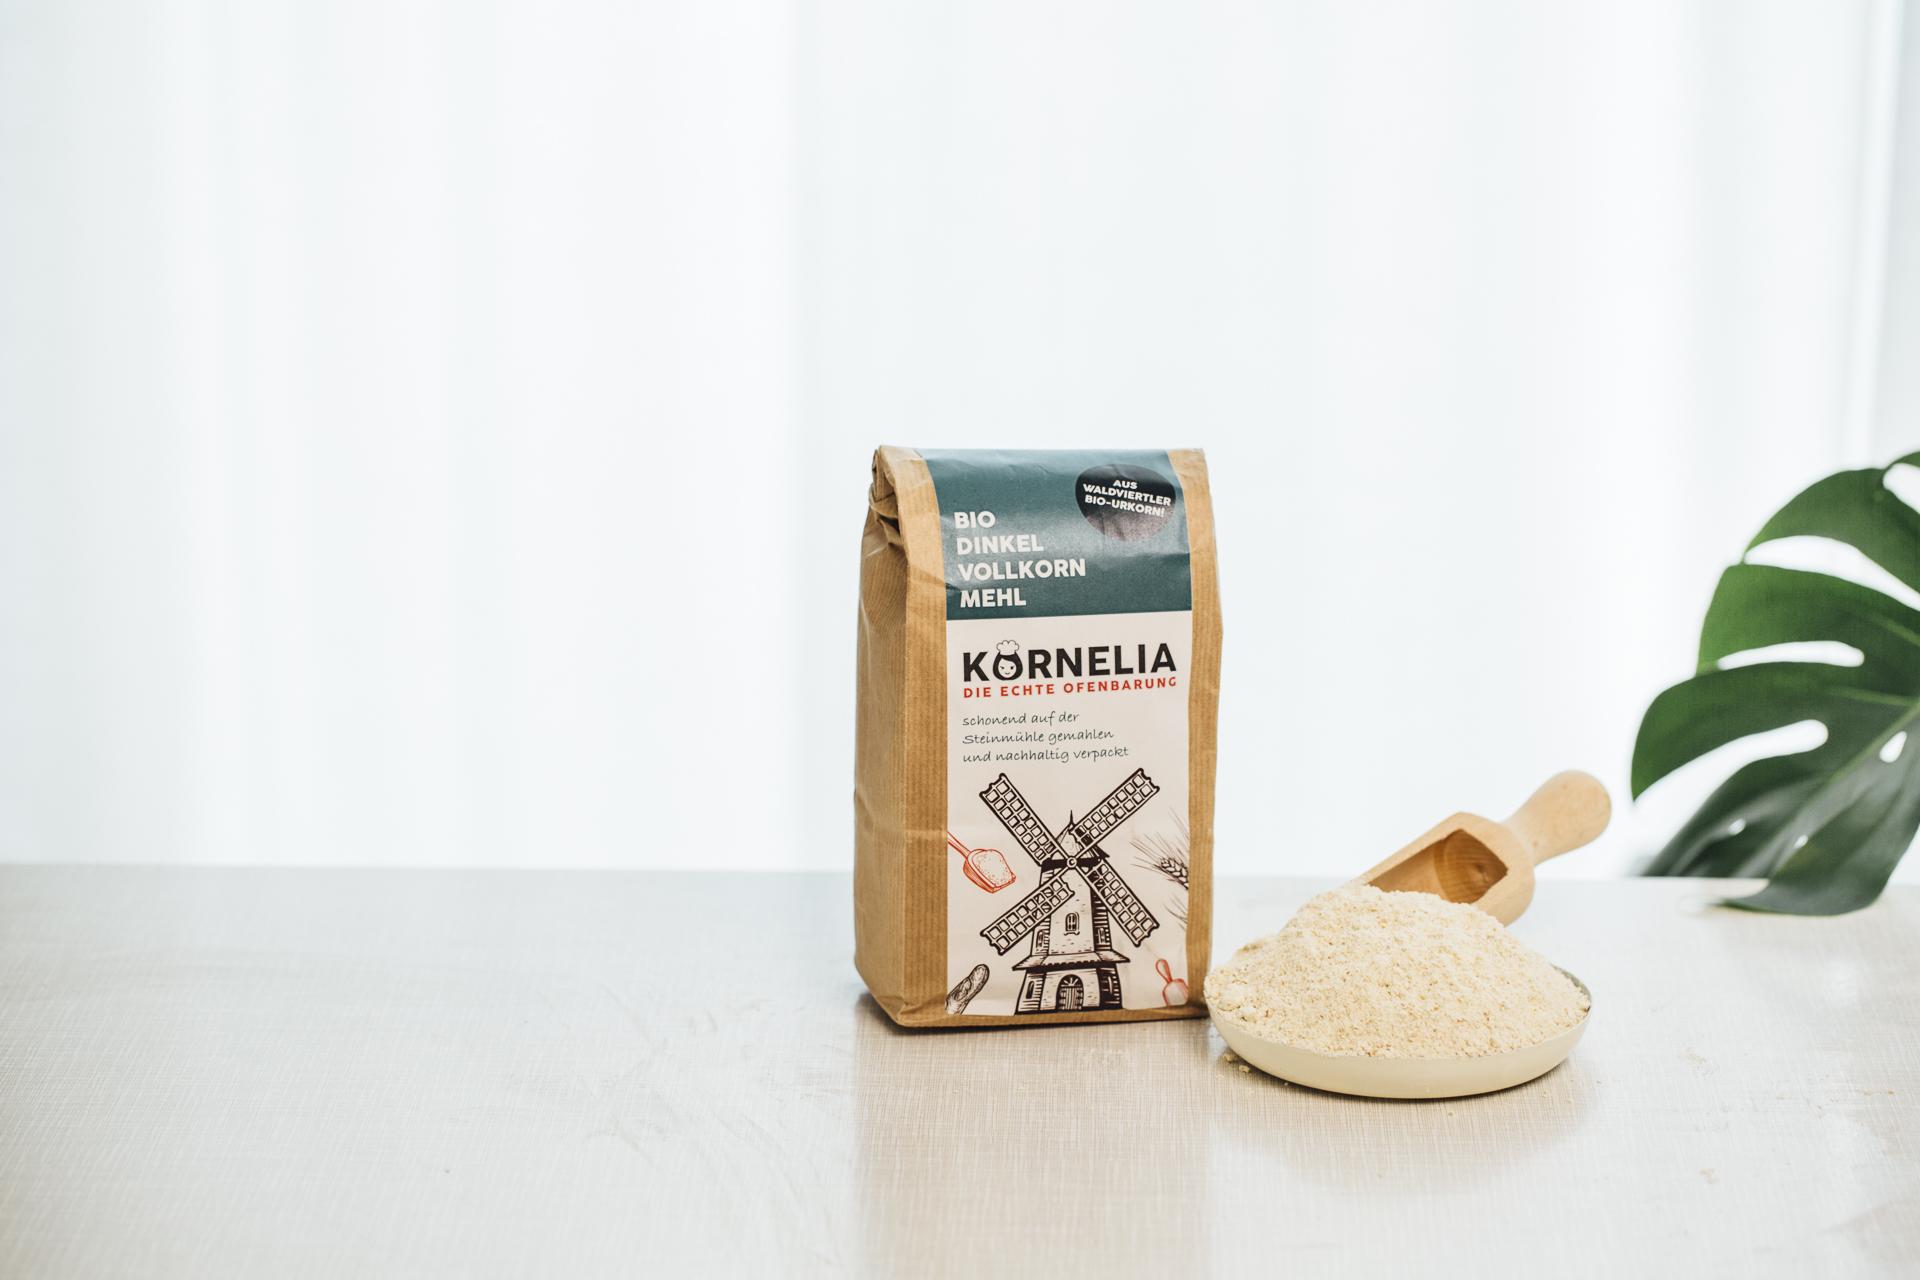 https://kornelia-urkorn.at/wp-content/uploads/2019/10/MH_20191126_KORNELIA_Produktshooting_lores_0023.jpg